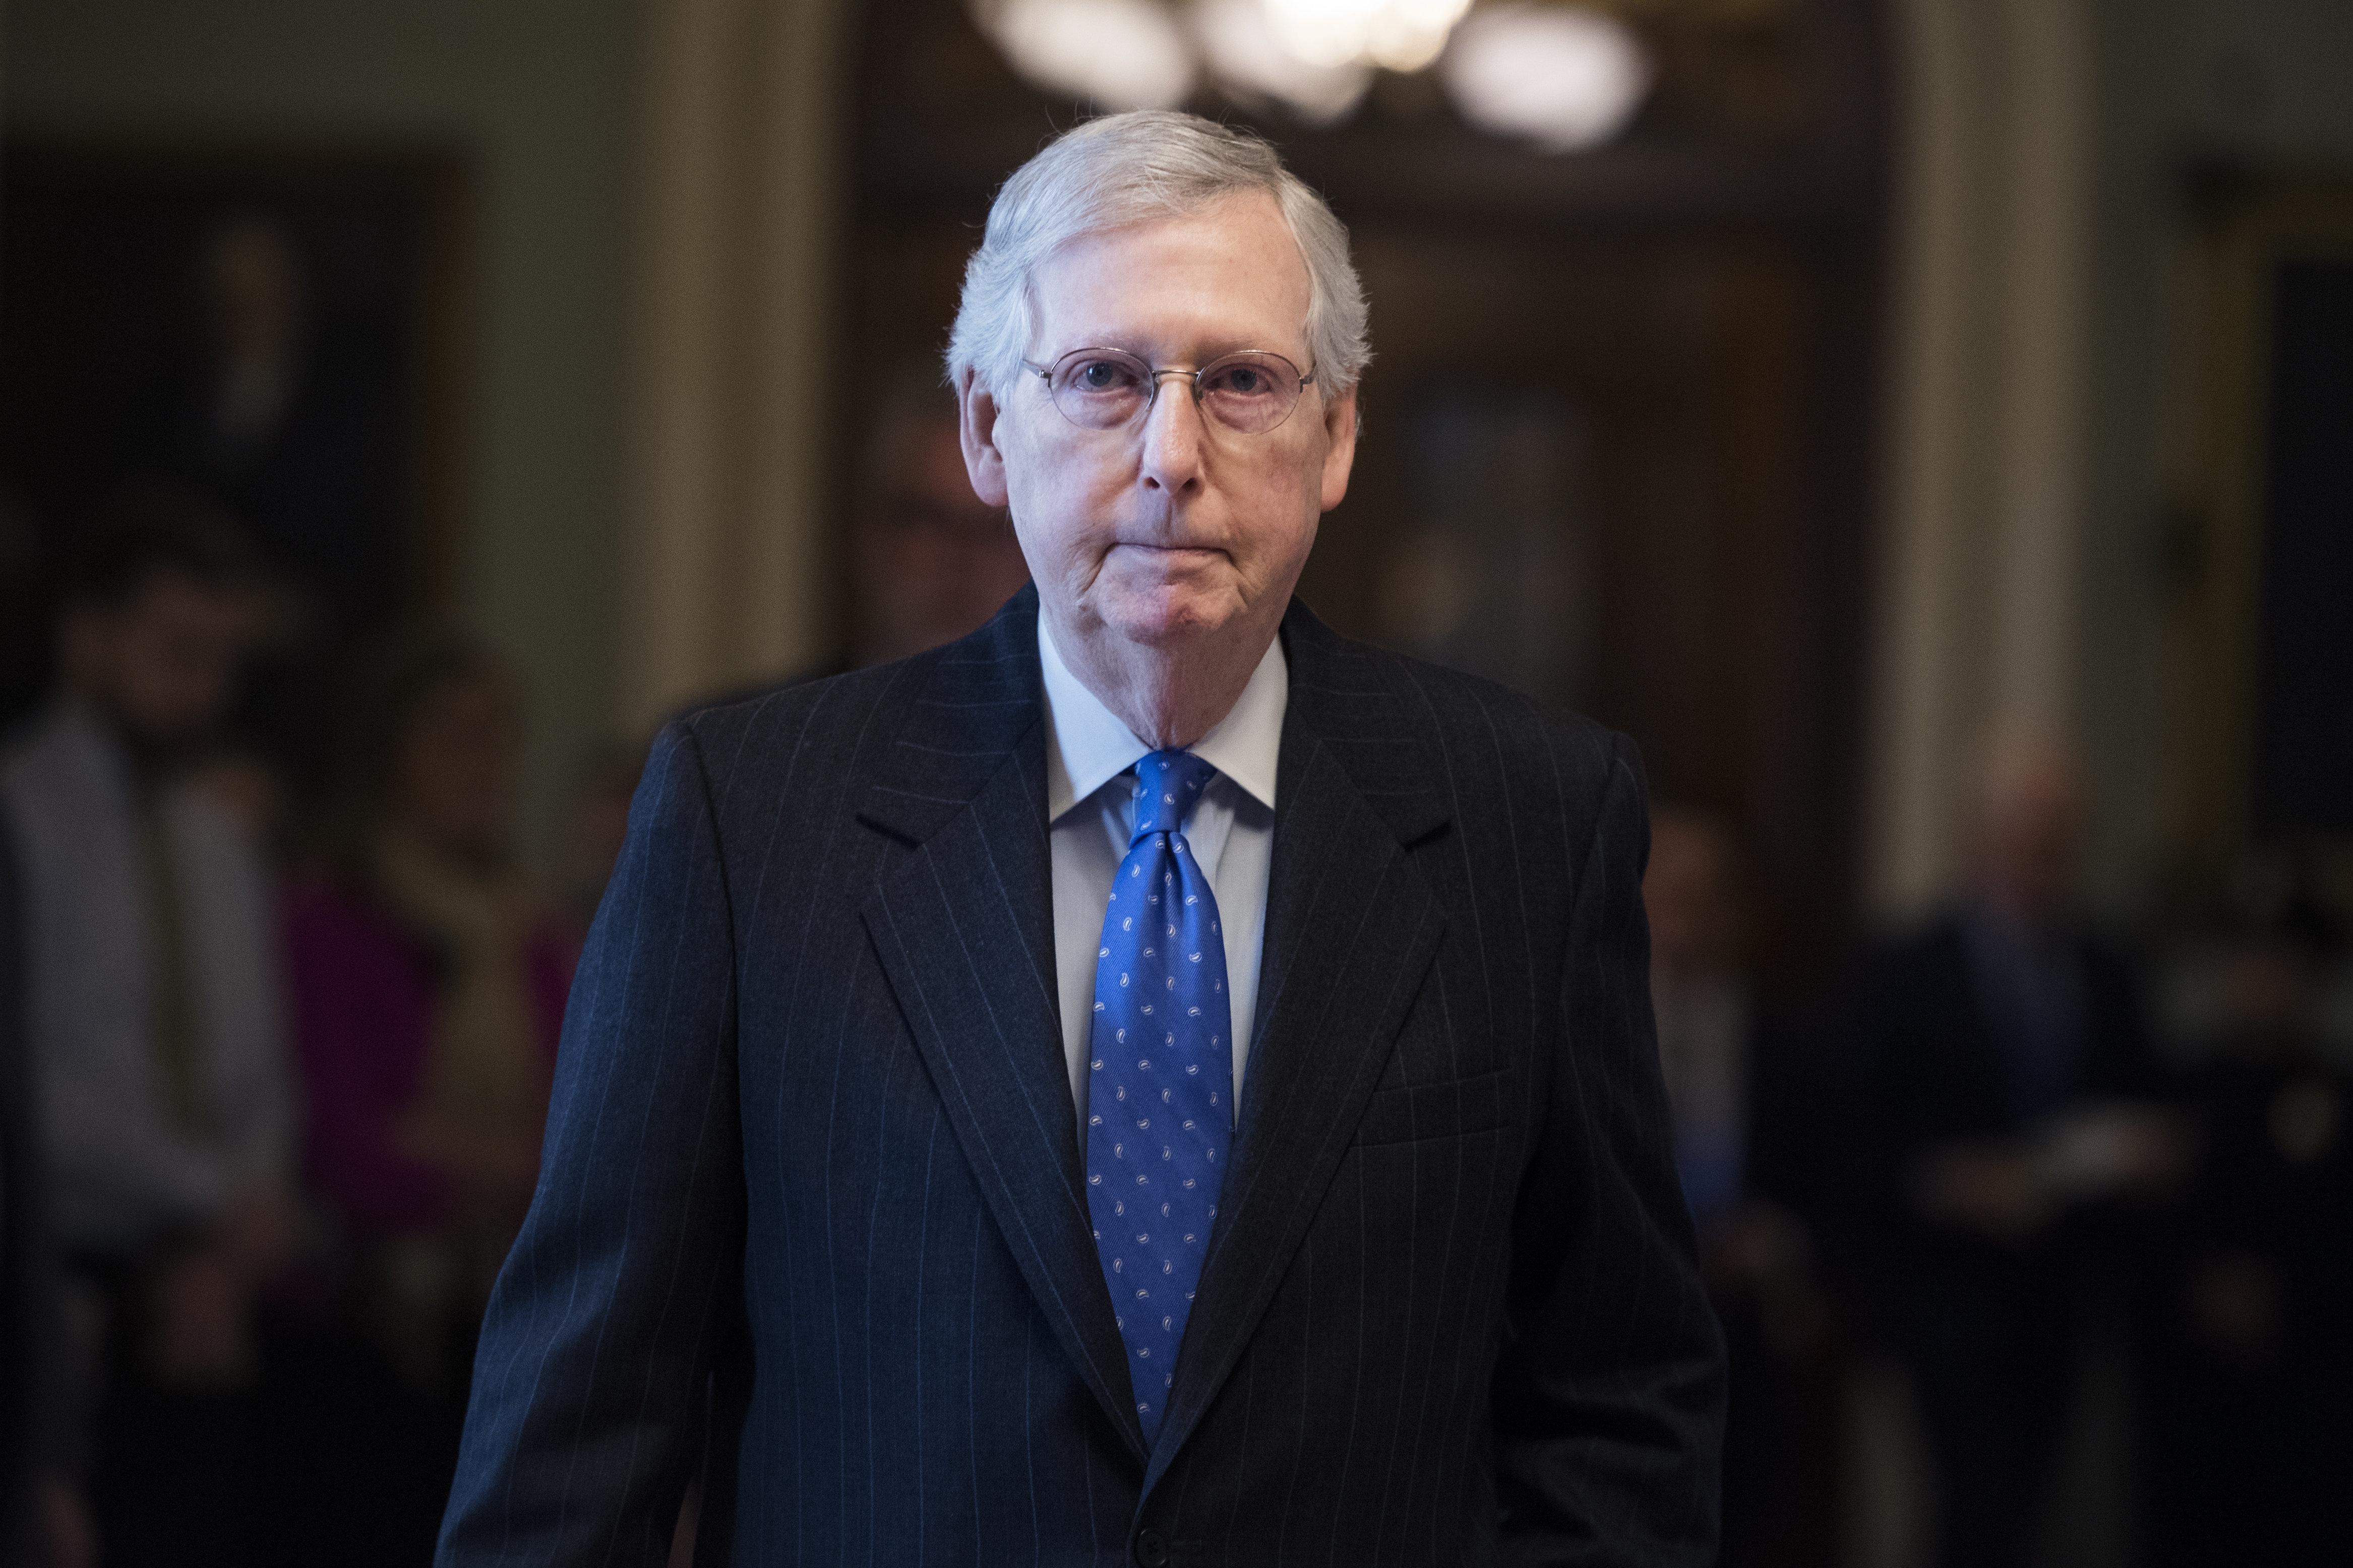 huffingtonpost.com - Igor Bobic - Senate GOP Blocks Bid To Enforce Sanctions On Putin Ally